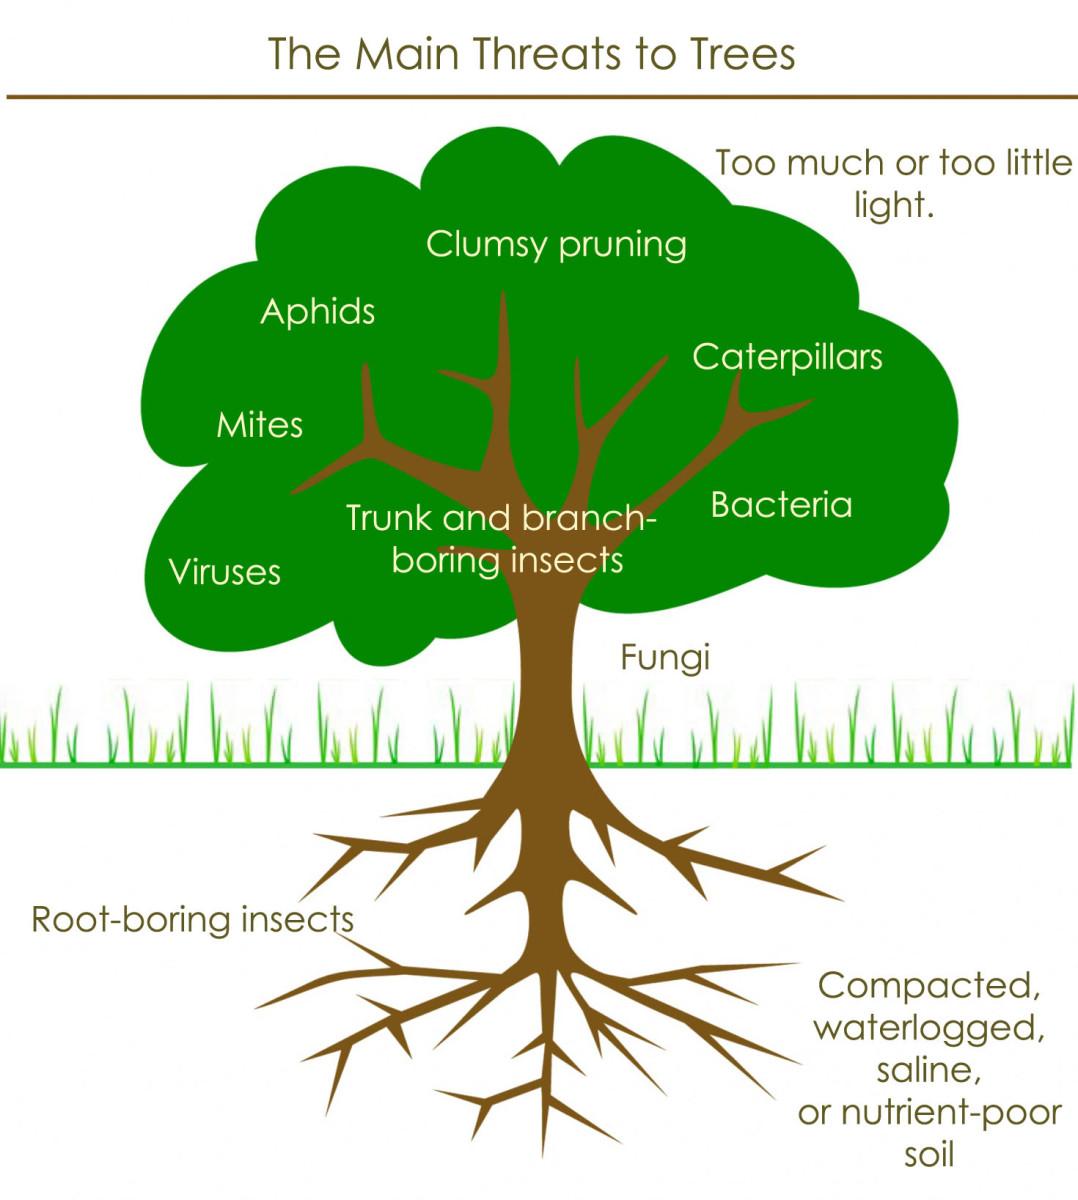 Things that make a tree sick